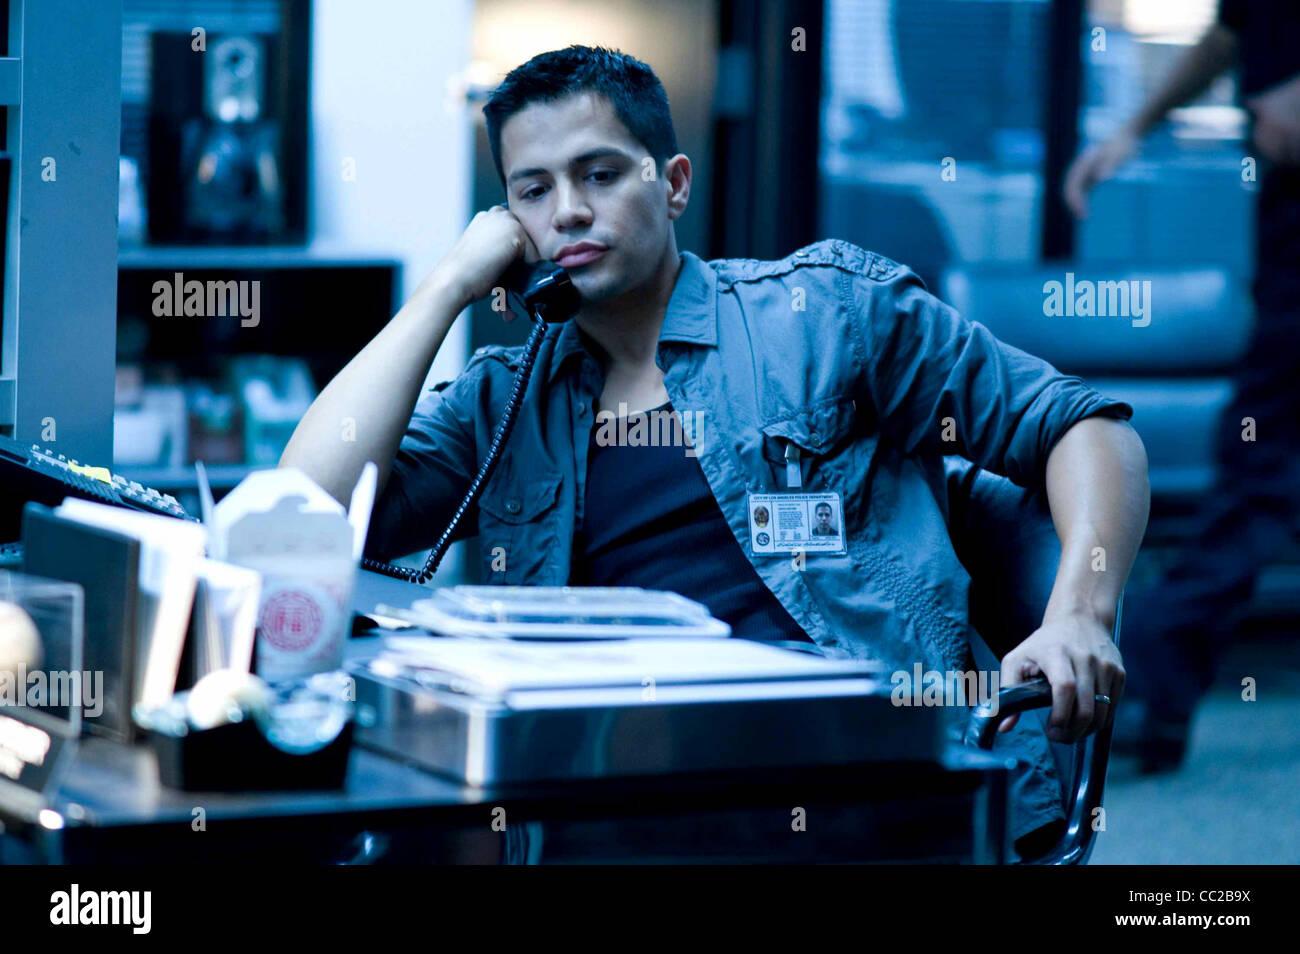 JAY HERNANDEZ TAKERS (2010 Stock Photo, Royalty Free Image ...